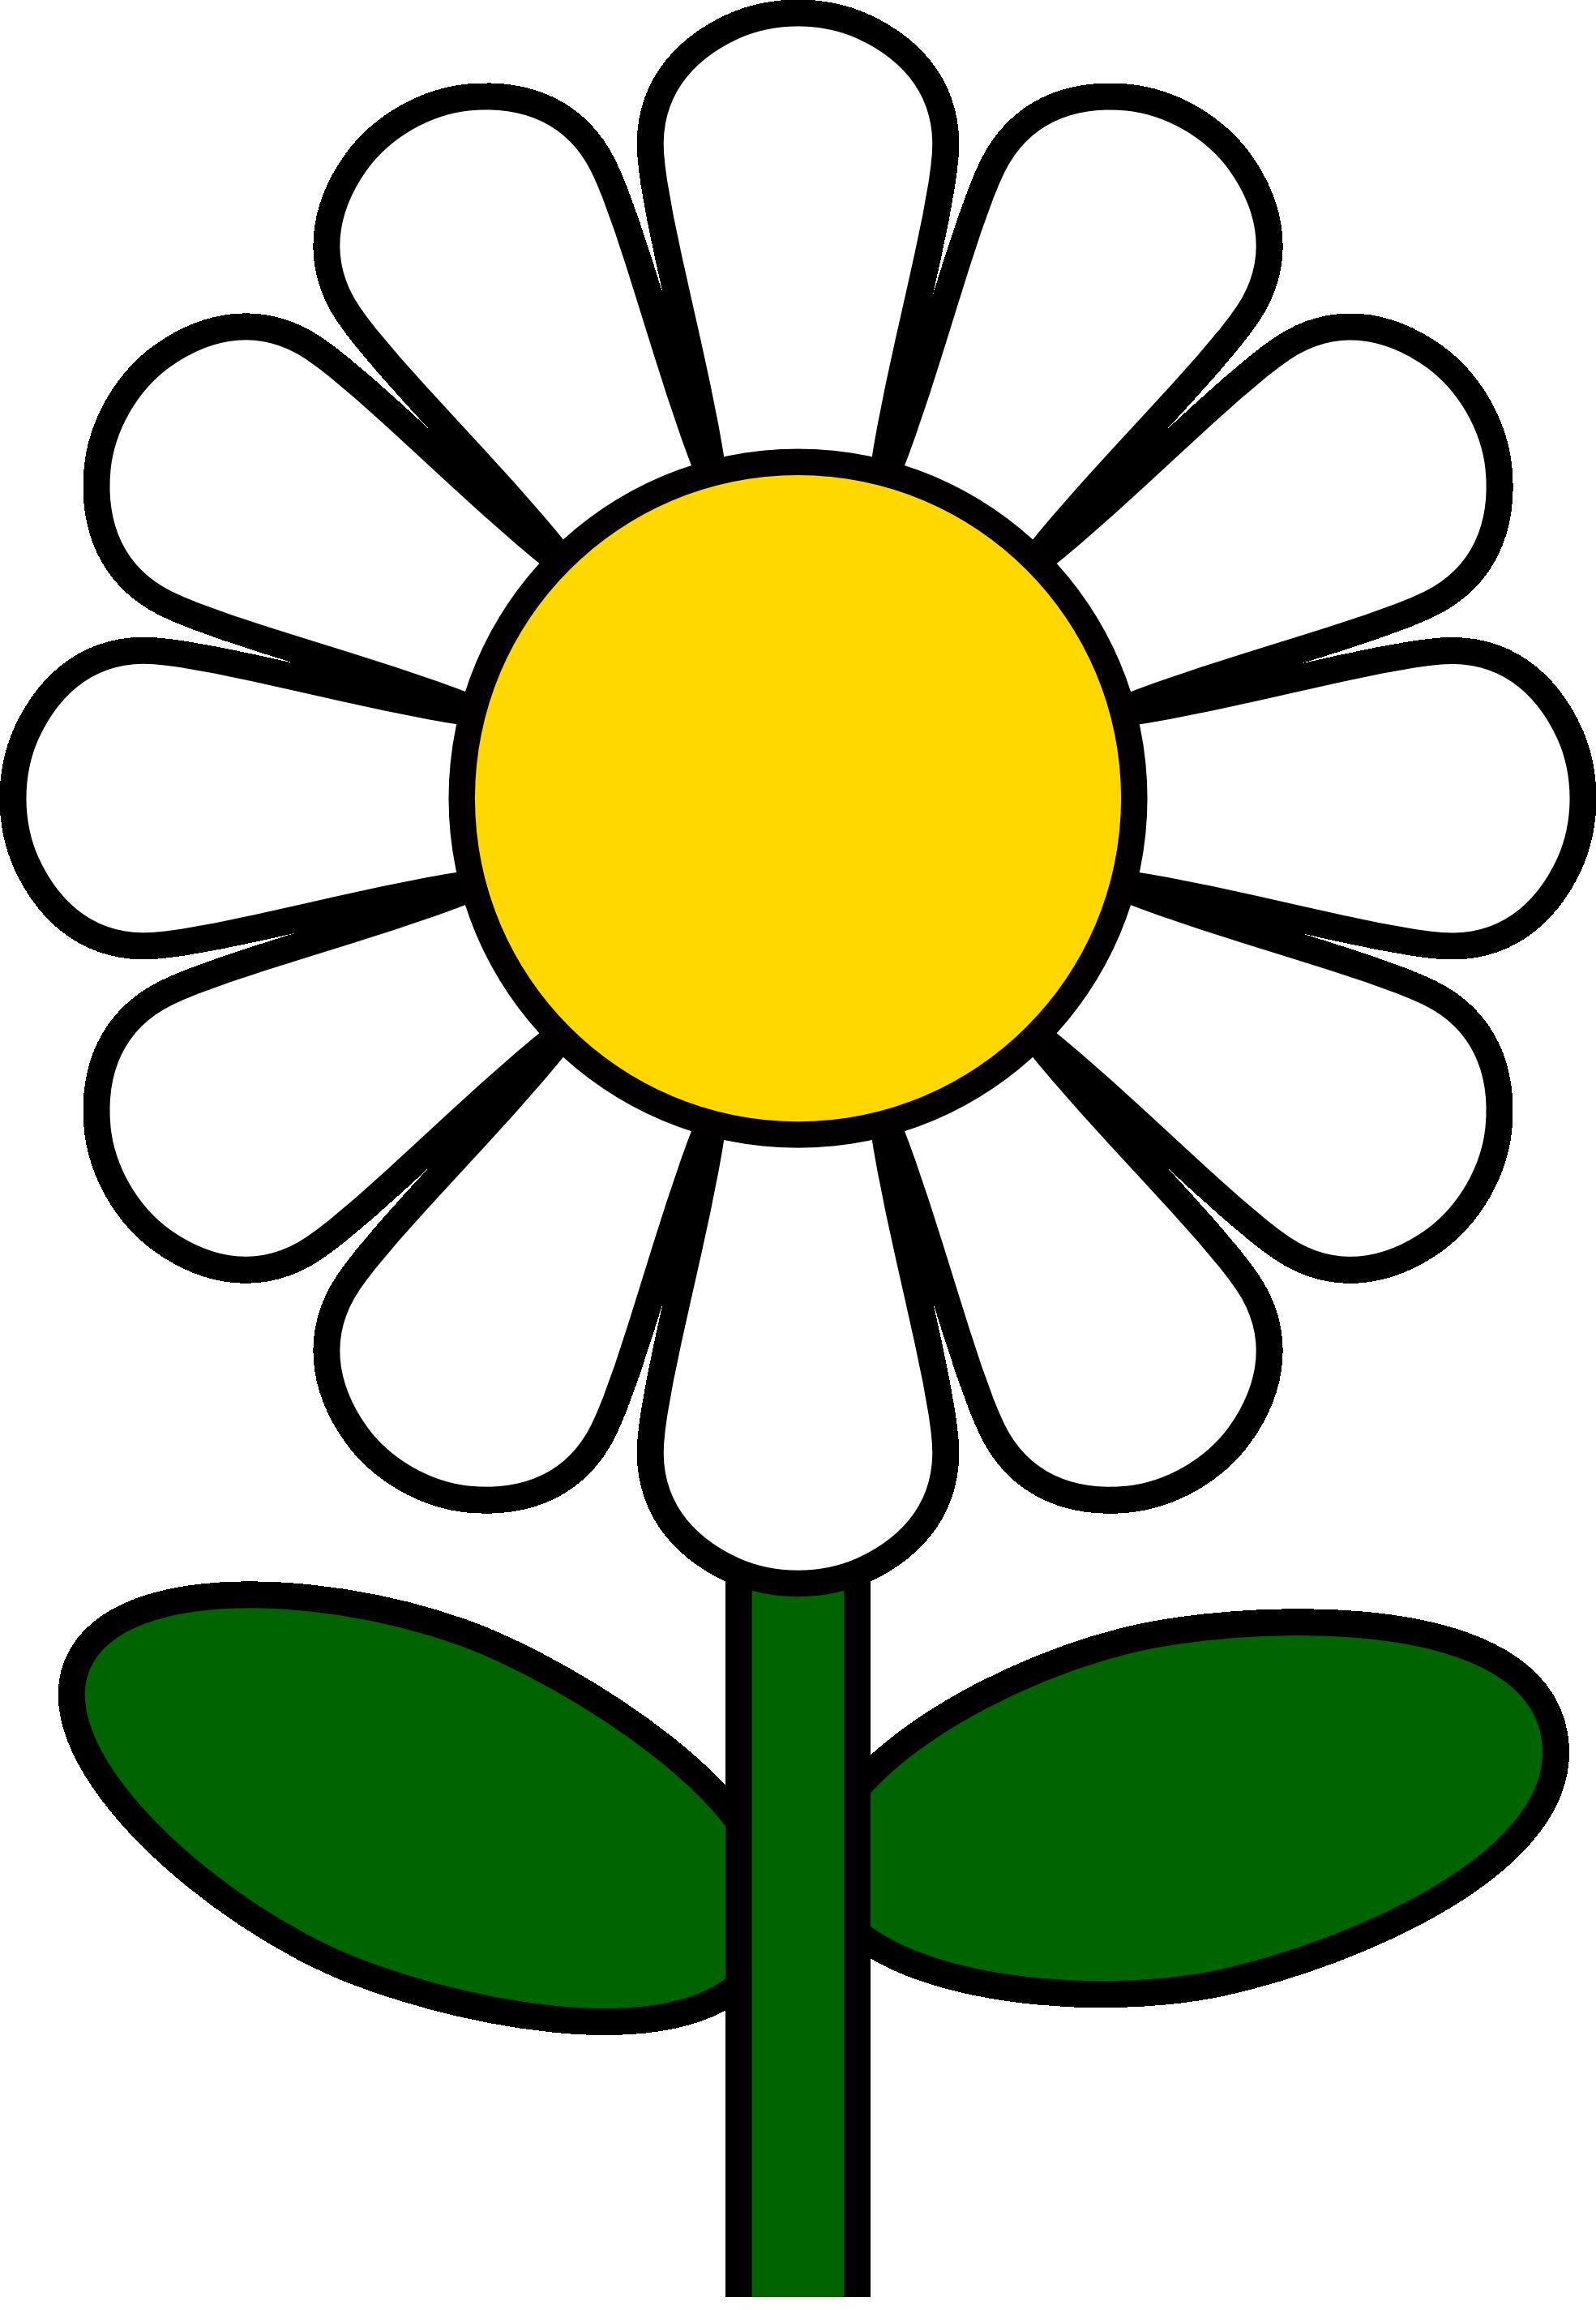 Cartoon Flowers Cliparts Free Download Best Cartoon Flowers